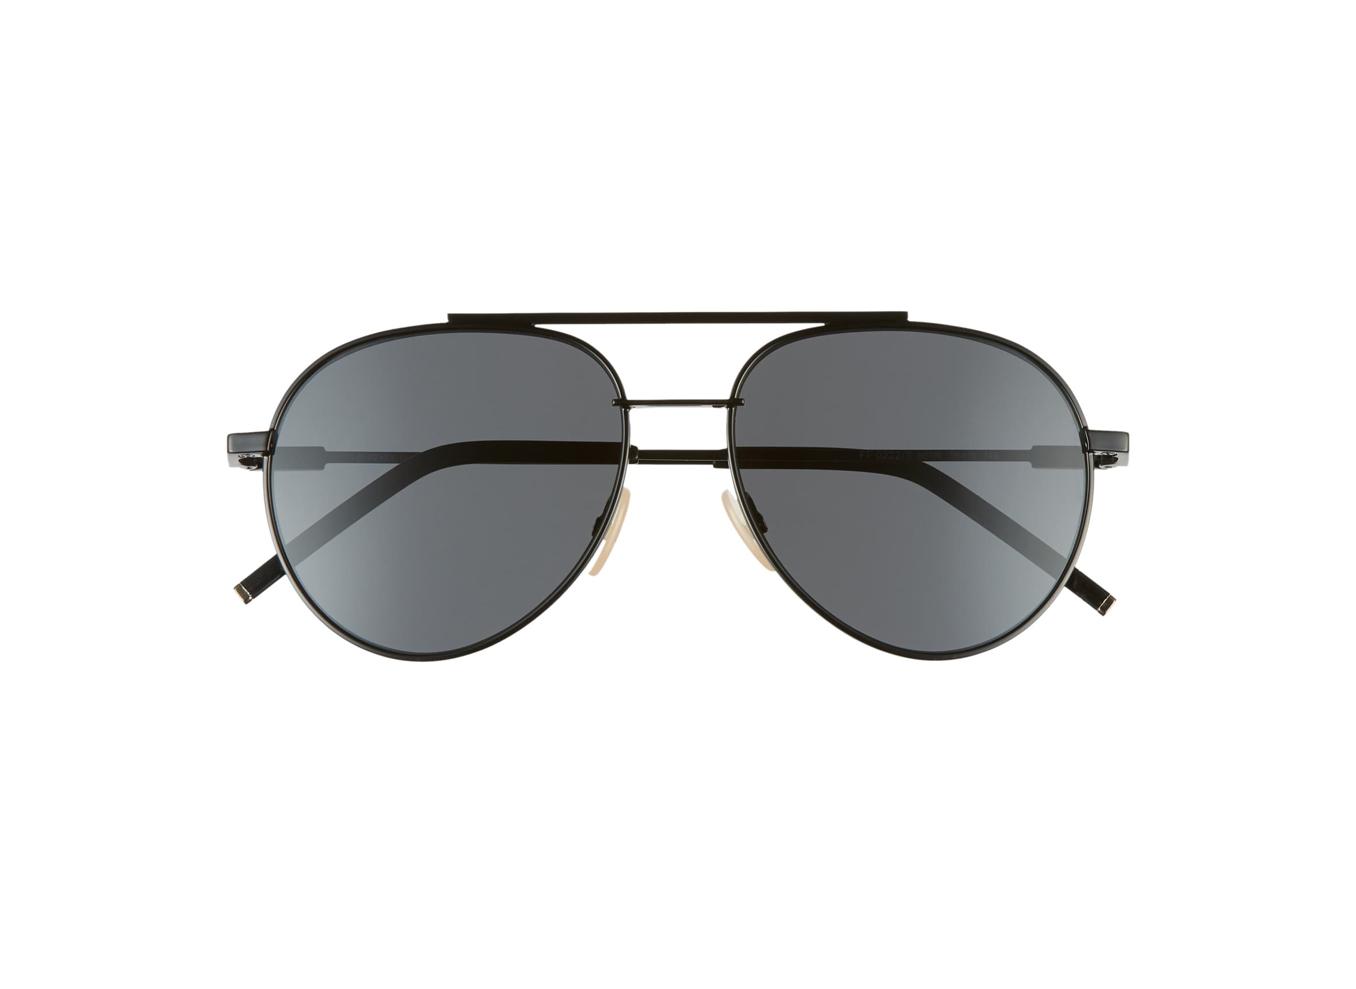 Fendi 56mm Aviator Sunglasses